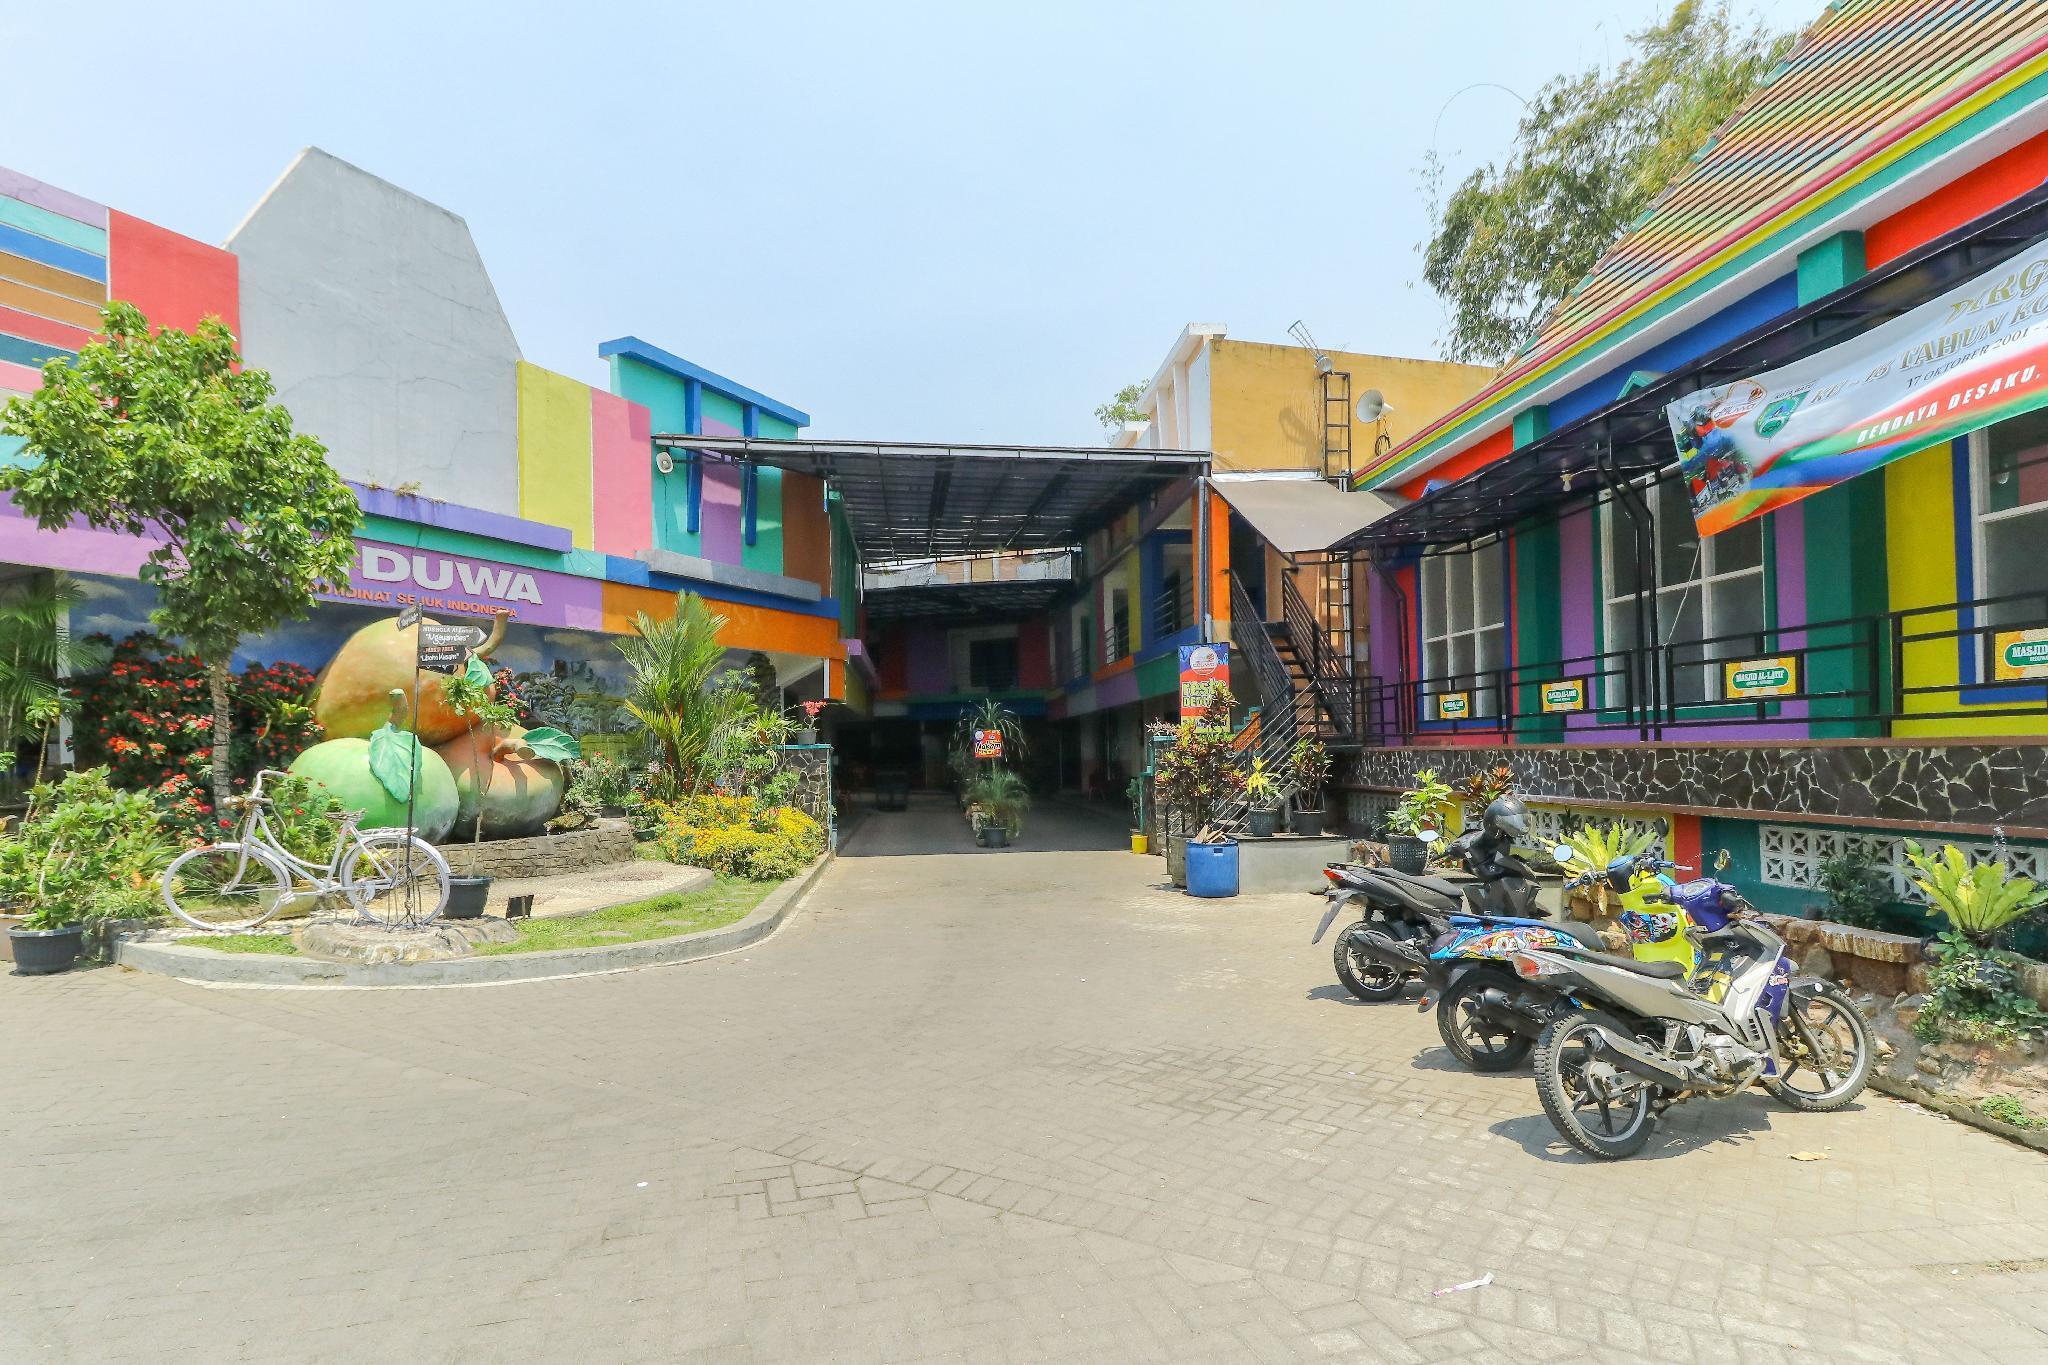 Deduwa Inn Transit Guesthouse Bed And Breakfast Malang Deals Photos Reviews